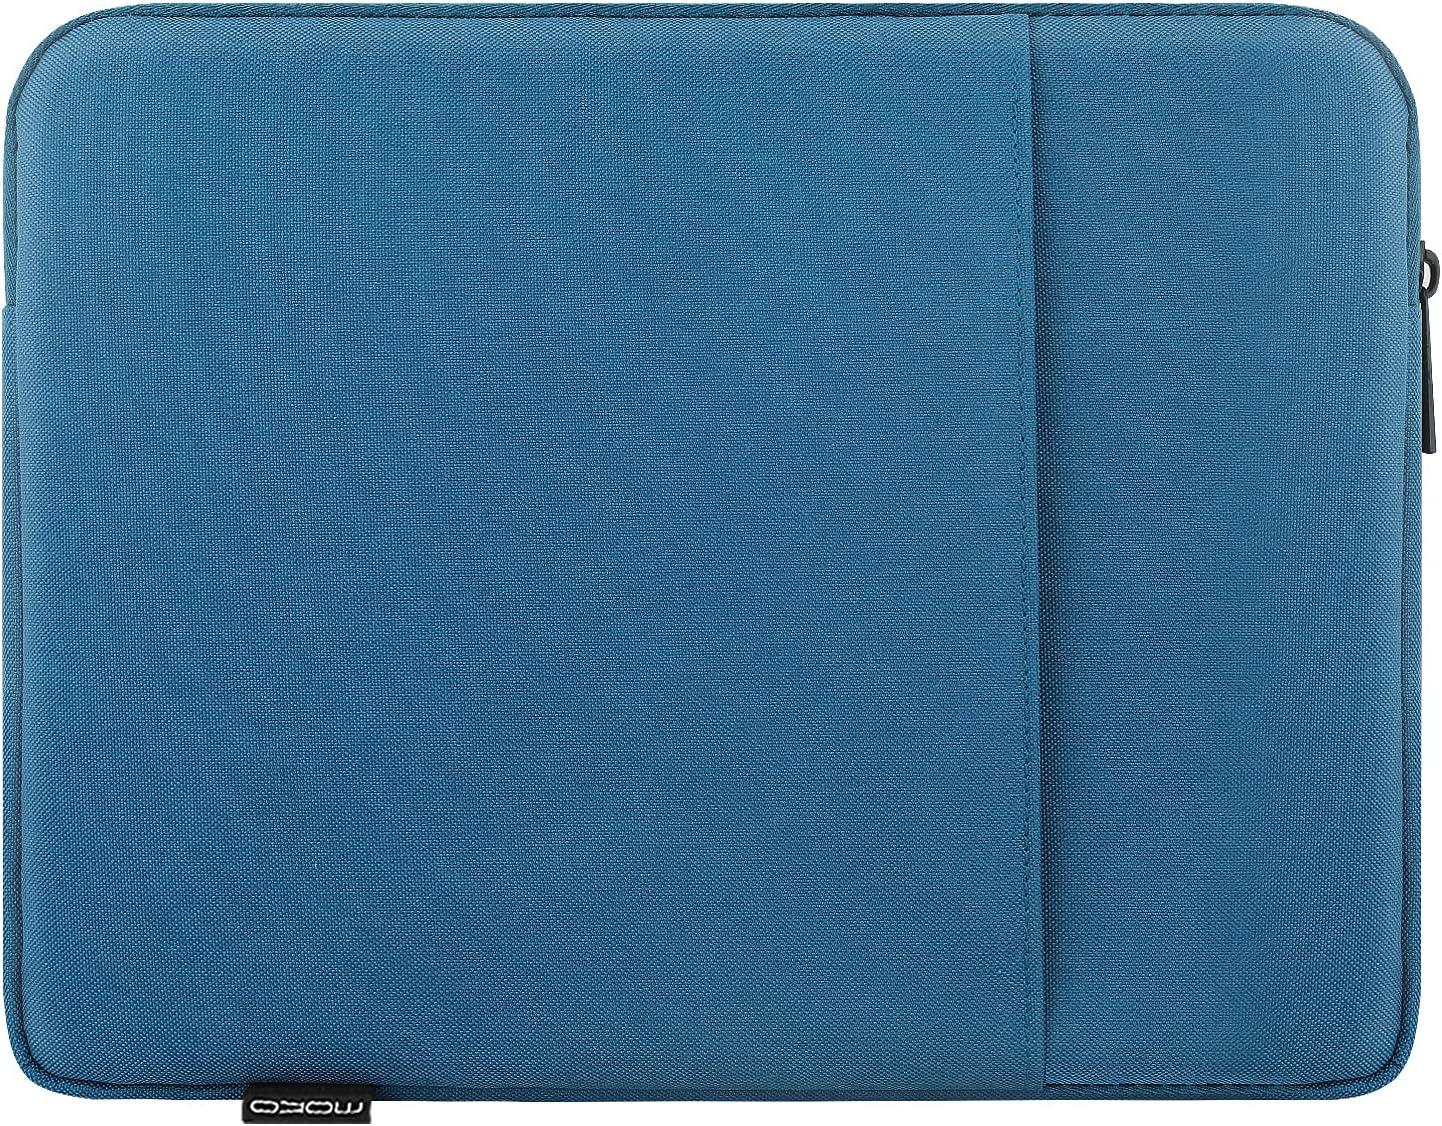 MoKo 11 Inch Tablet Sleeve Bag Carrying Case Fits iPad Pro 11 2021/2020/2018, iPad 8th 7th Generation 10.2, iPad Air 4 10.9, iPad Air 3 10.5, iPad 9.7, Galaxy Tab A 10.1/Tab S6 Lite Fit Smart Keyboard